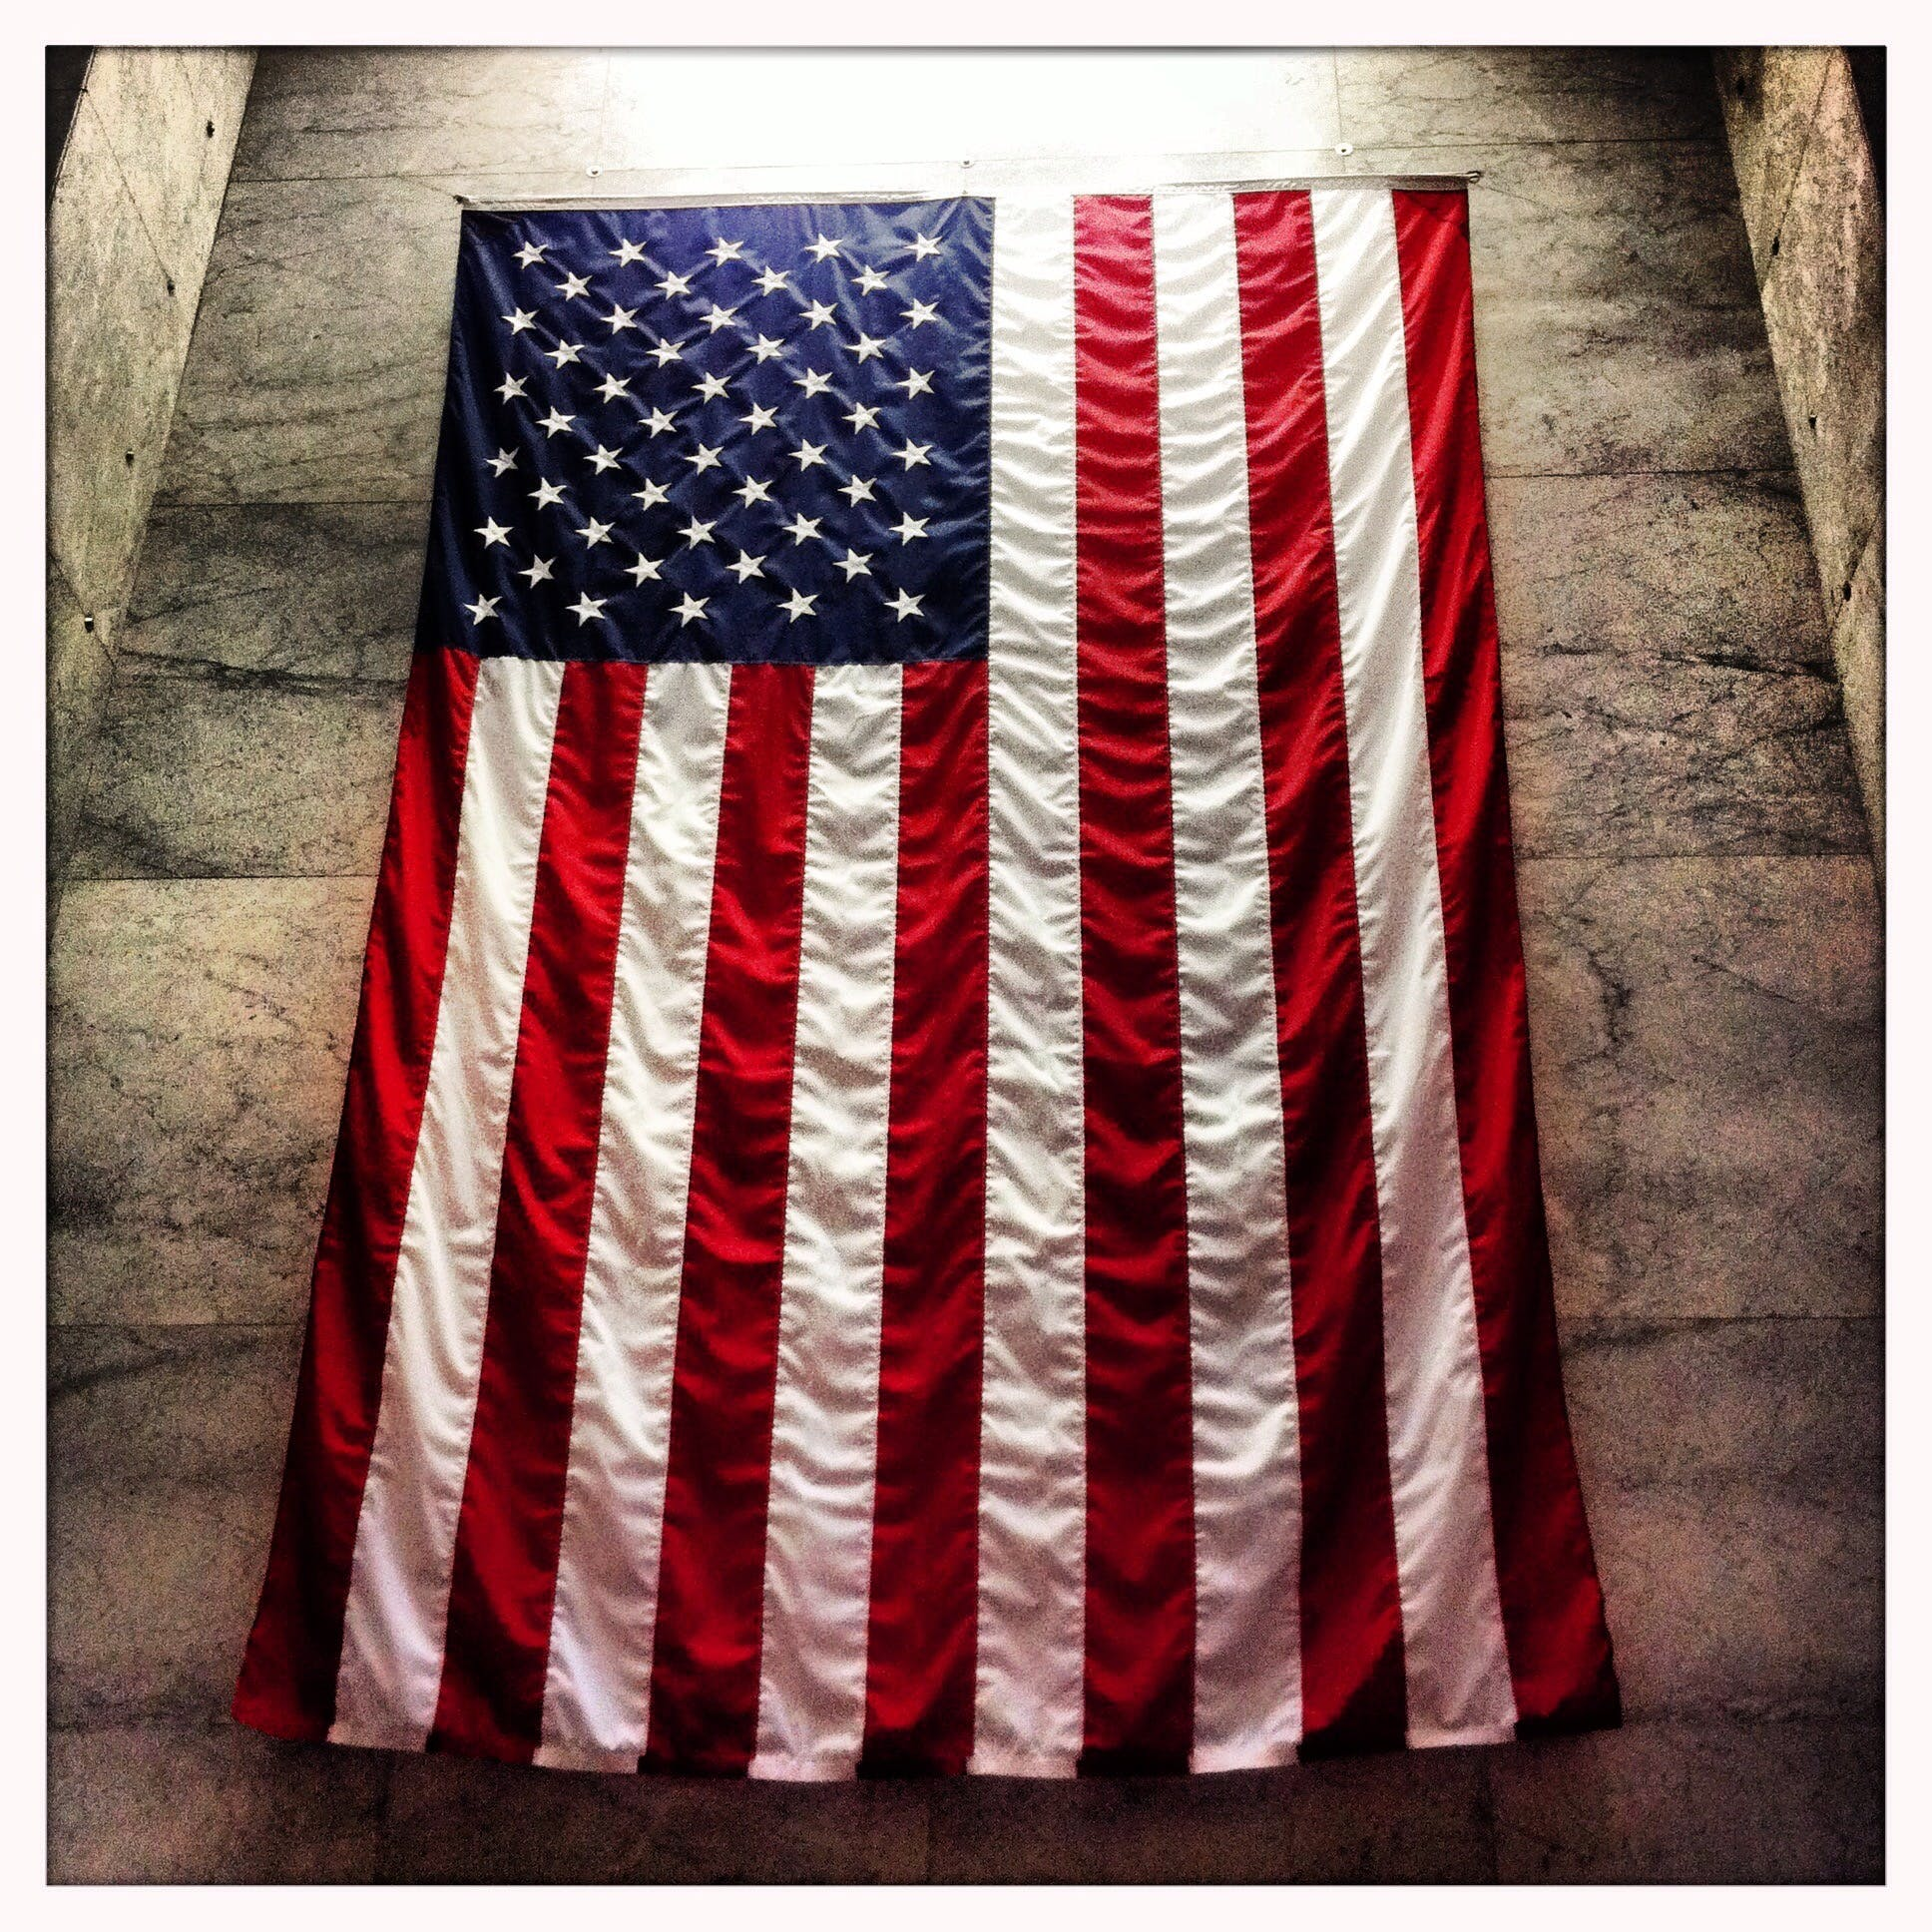 American flag, close -up, design